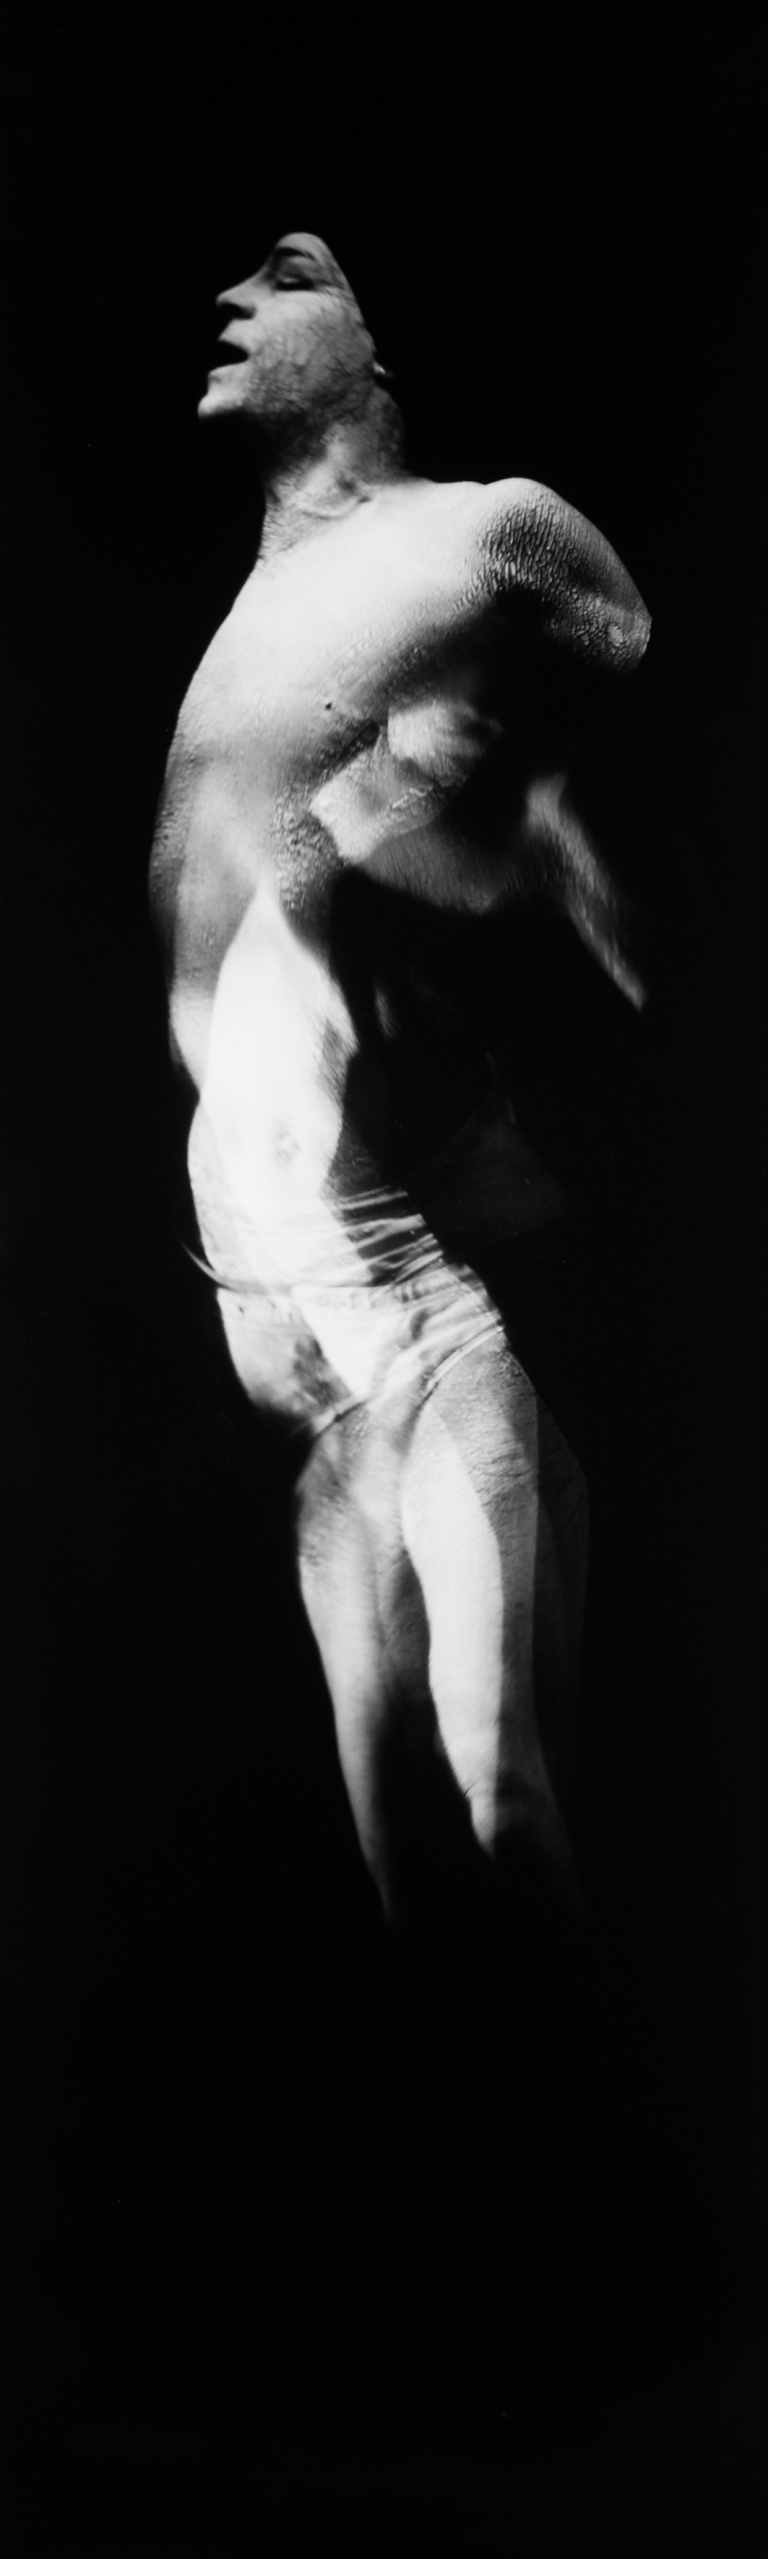 Bodypainting_09_2010©IMAGO-CAMERA_Susanna-Kraus_300